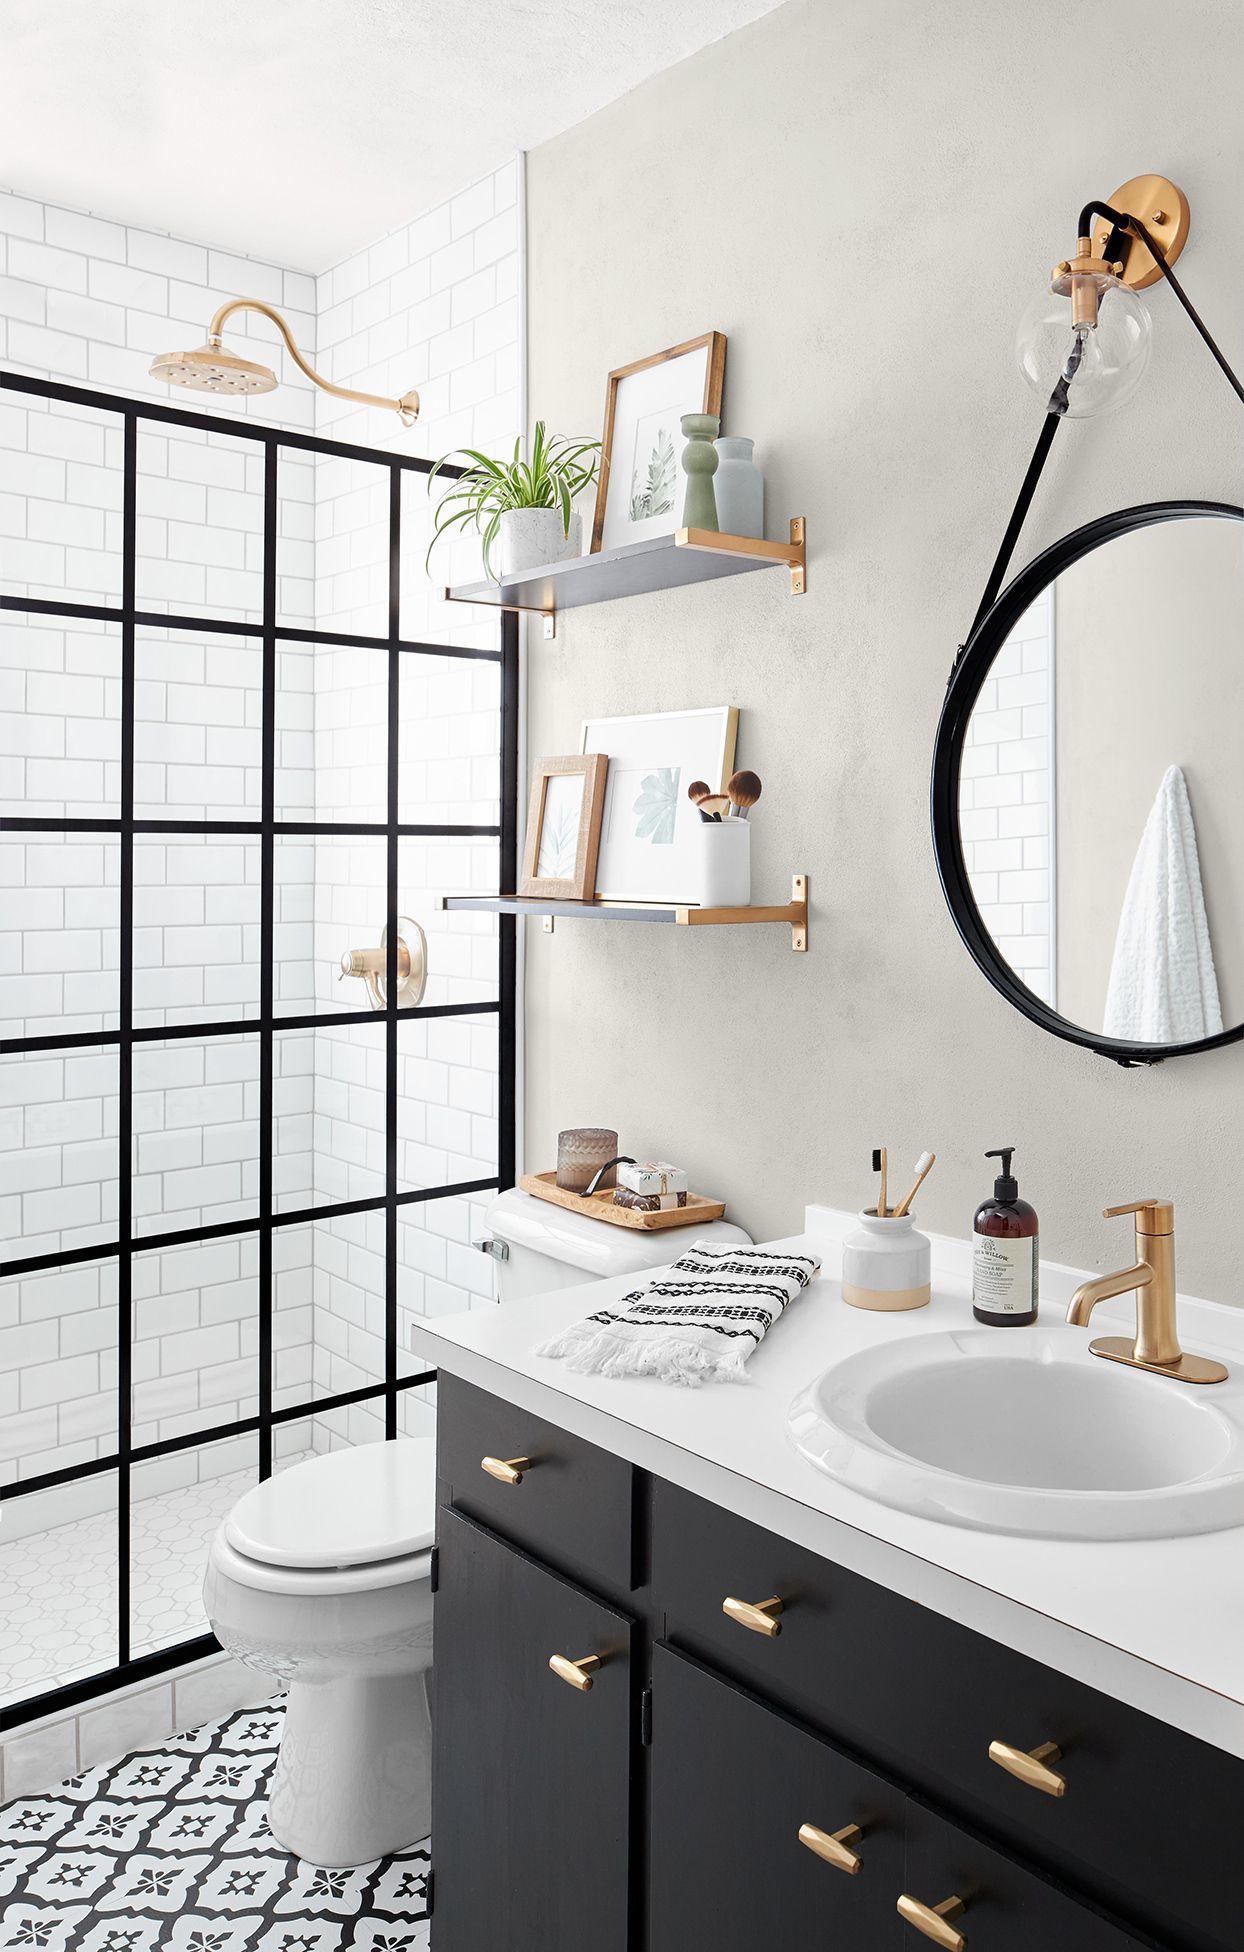 19 Creative Storage Ideas To Solve Your Small Space Problems Bathroom Interior Design Small Bathroom Makeover Diy Bathroom Remodel